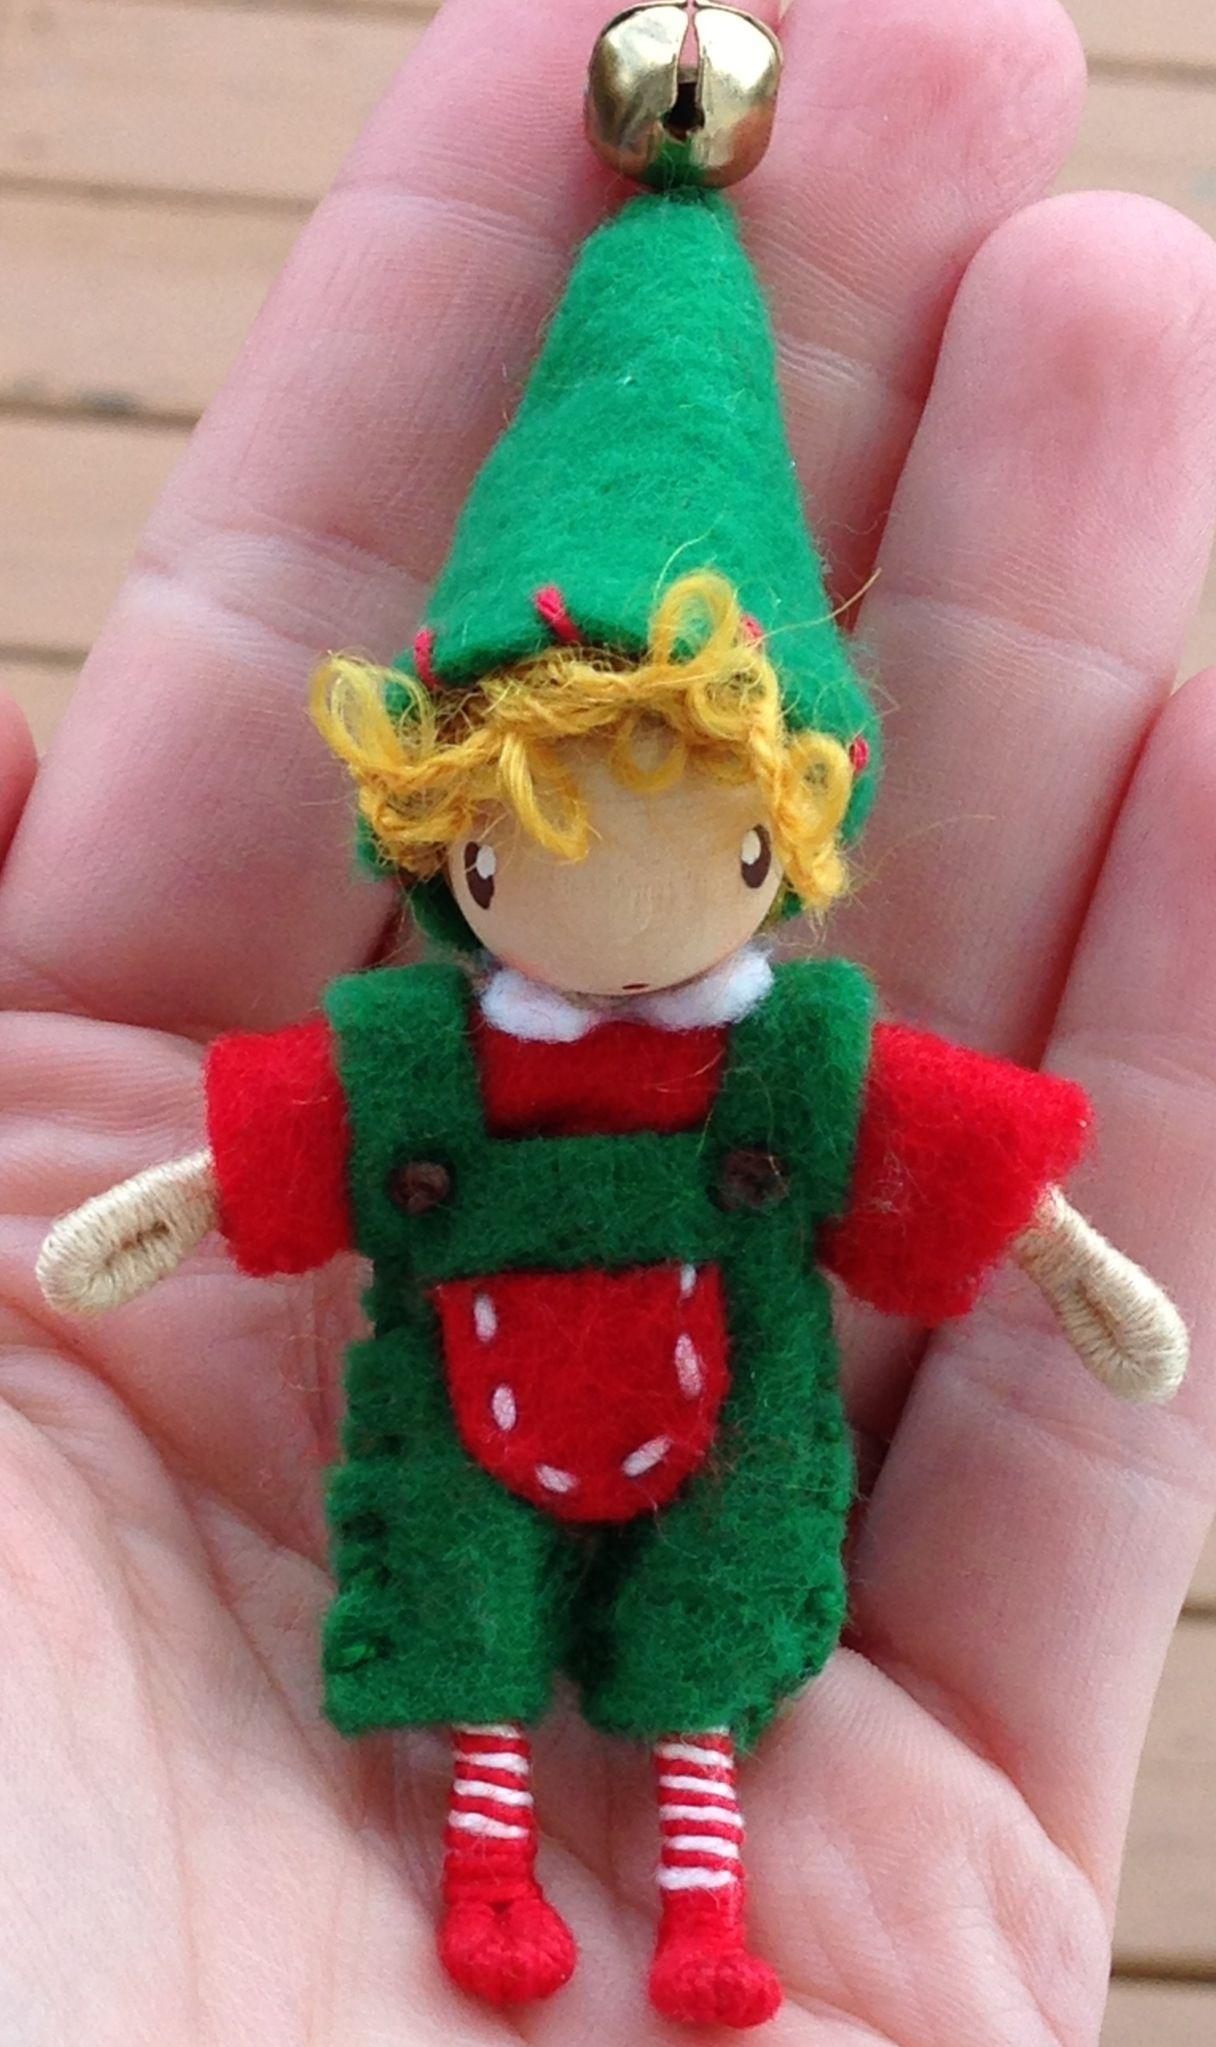 Christmas elf a waldorf inspired bendy doll http://www.etsy.com/shop ...